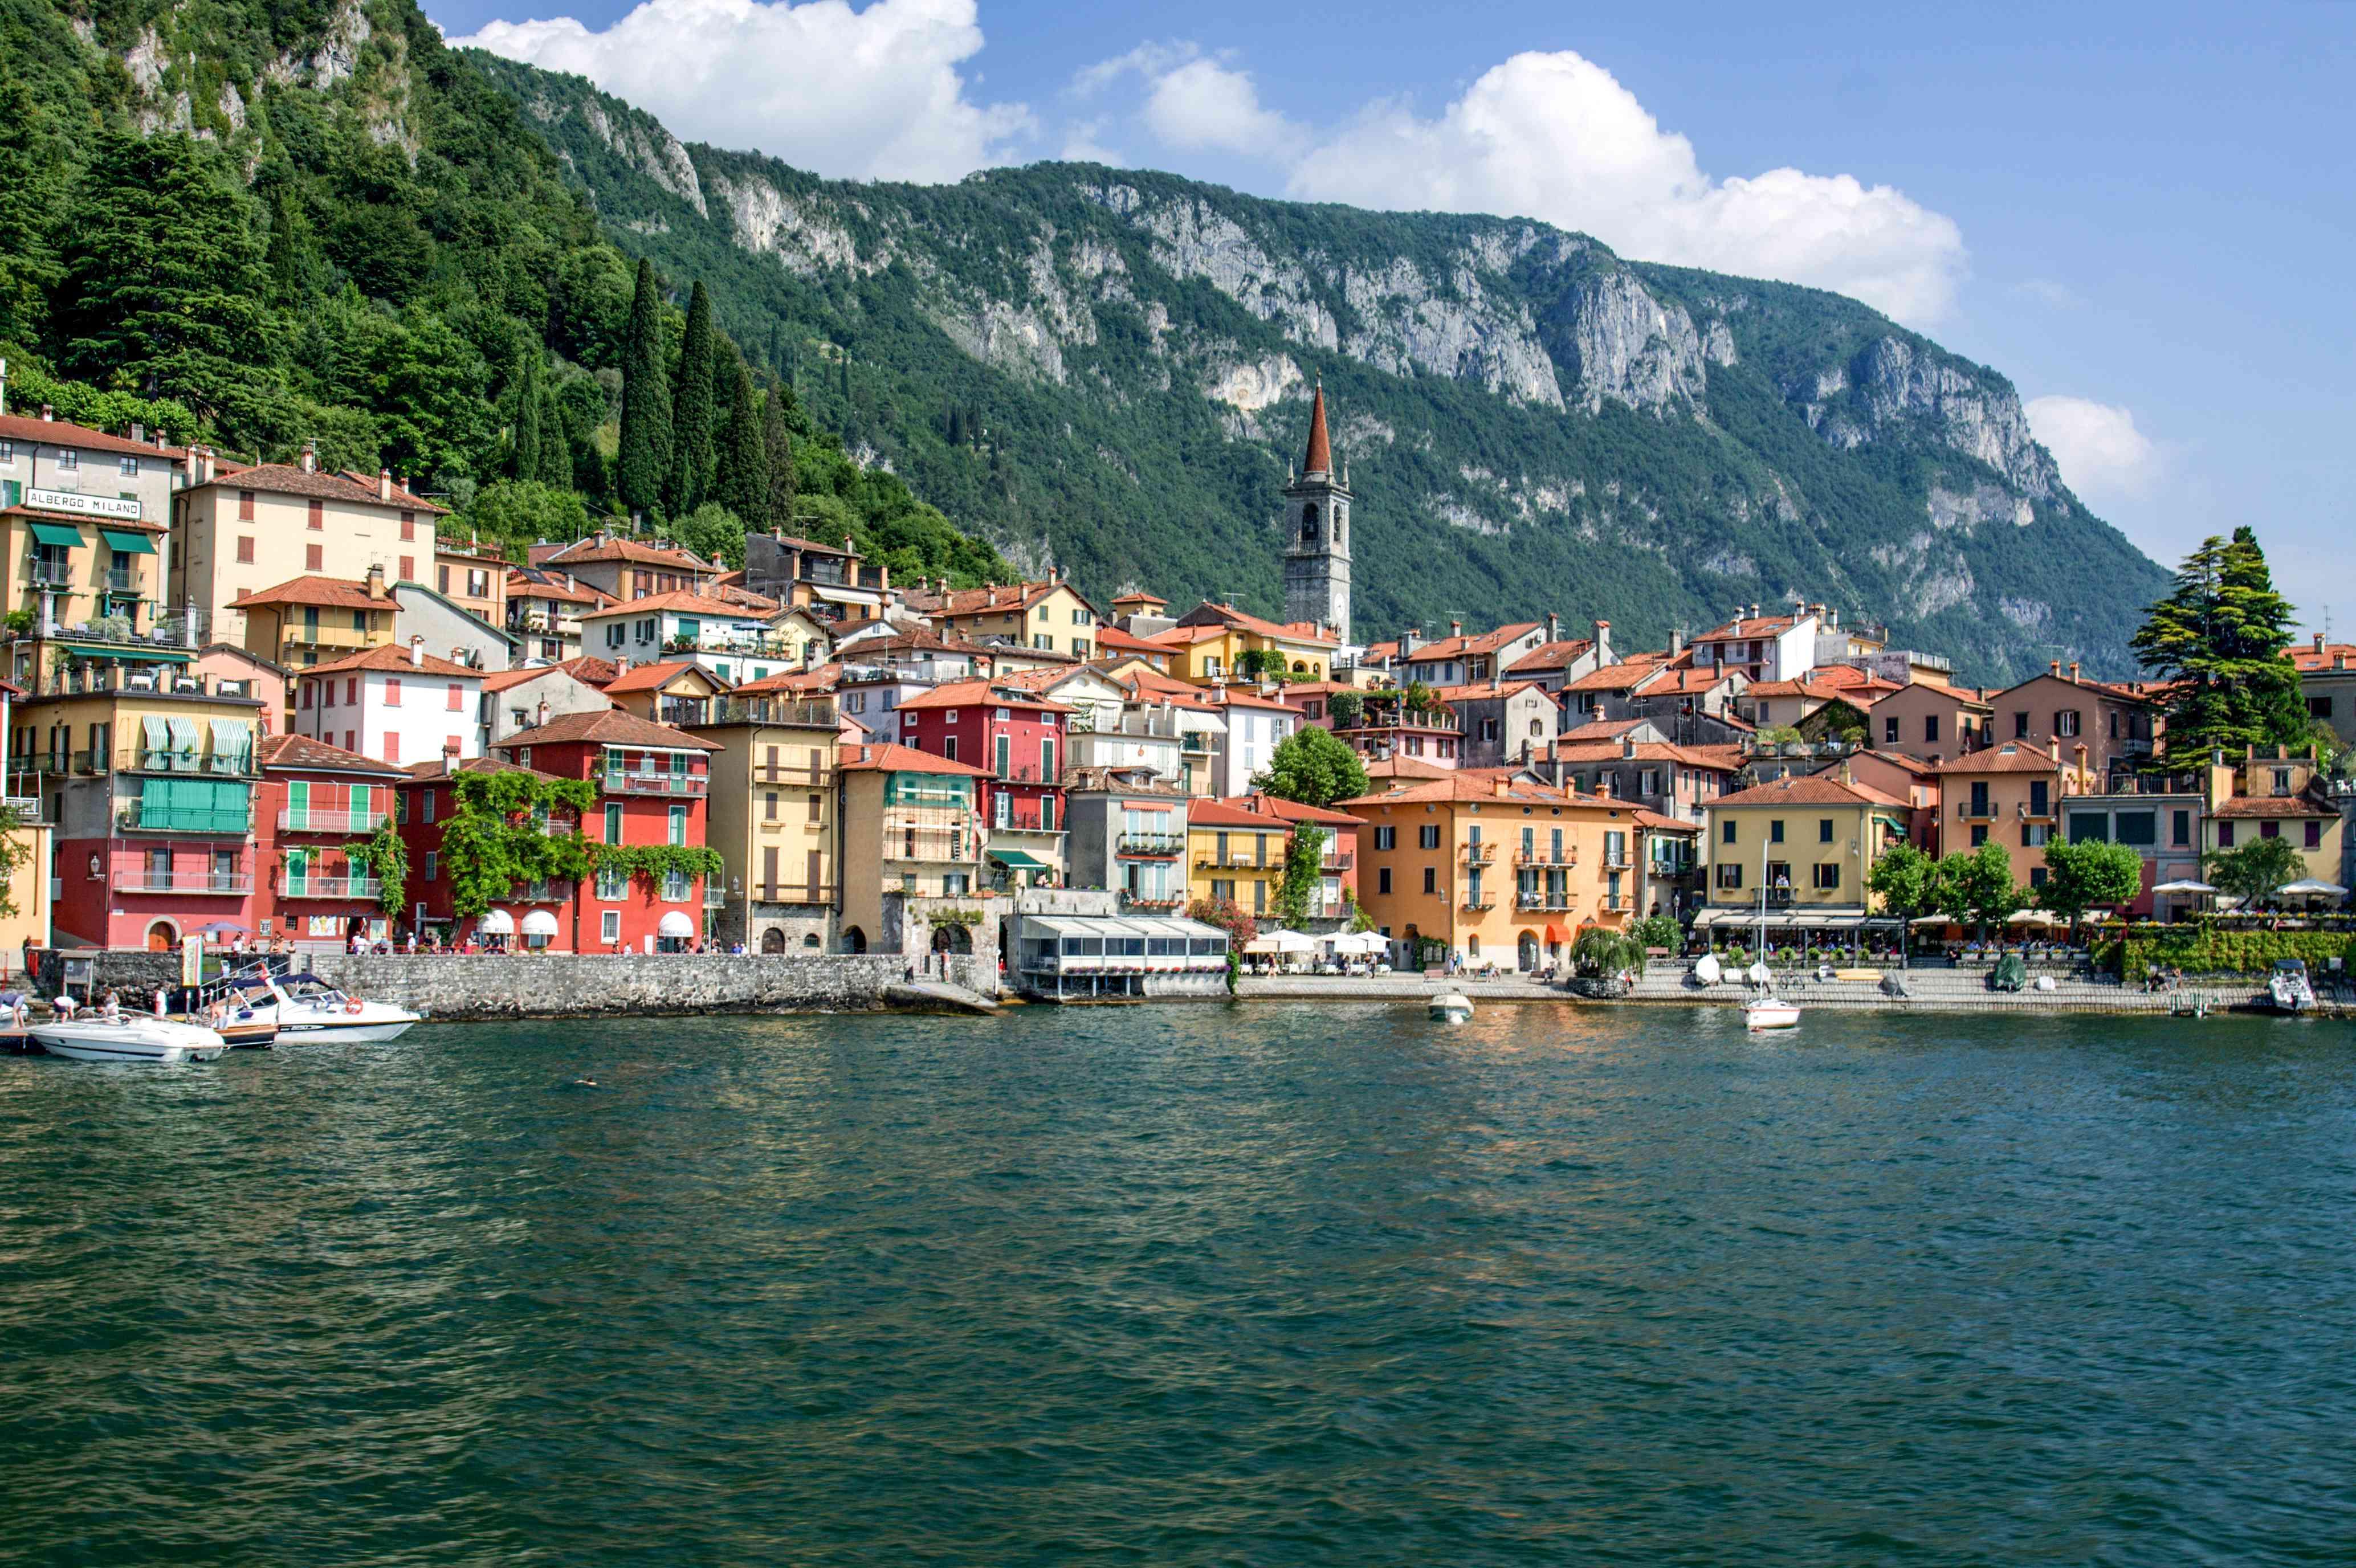 Shot of Varenna along the coast of Lake Como